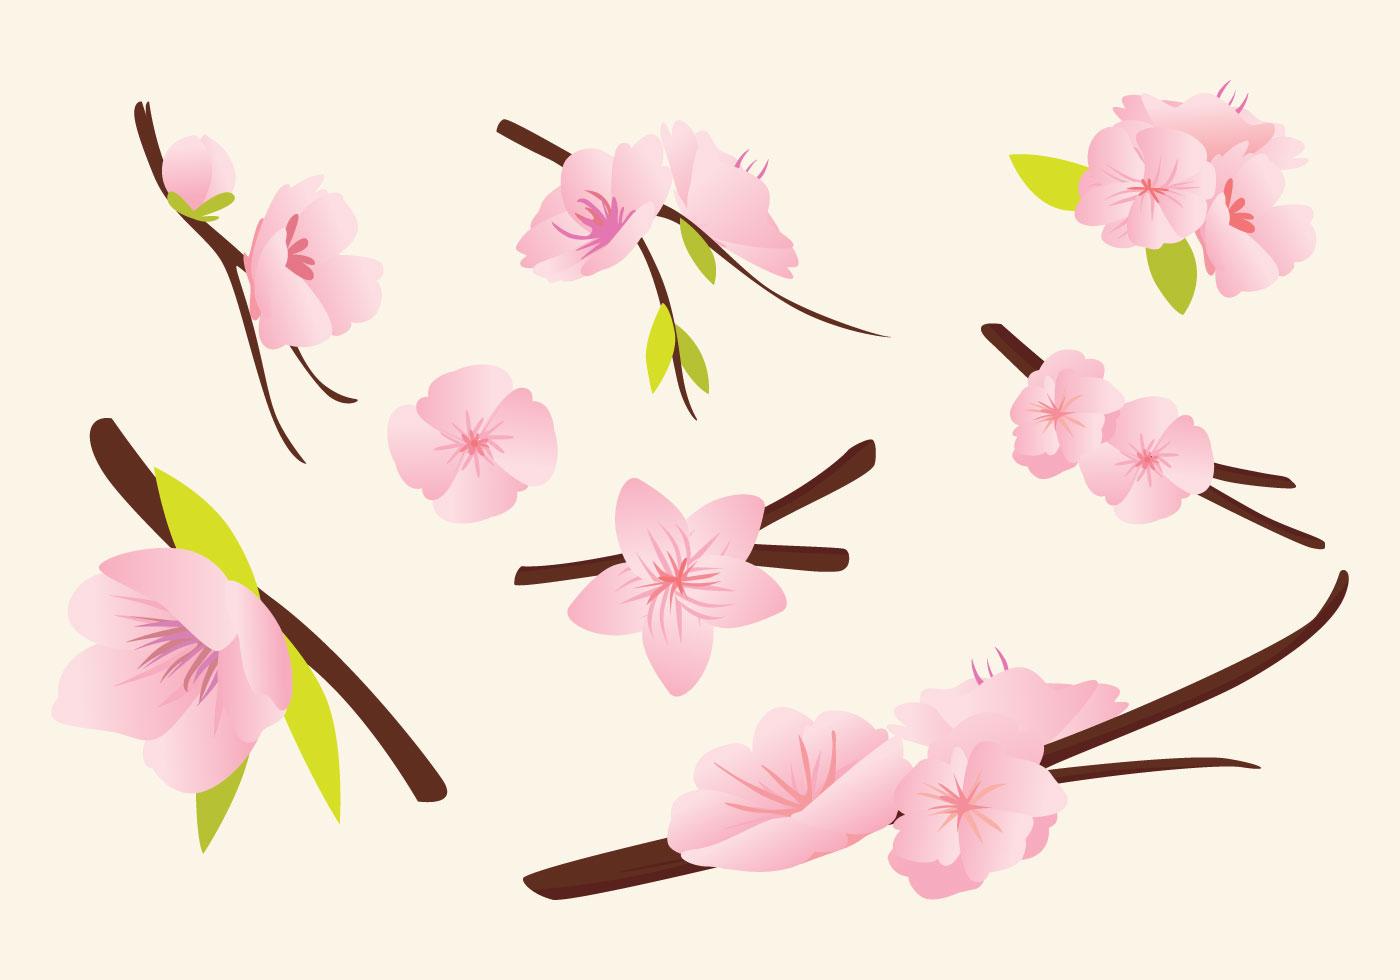 Peach blossom vector download free vector art stock for Peach tree designs